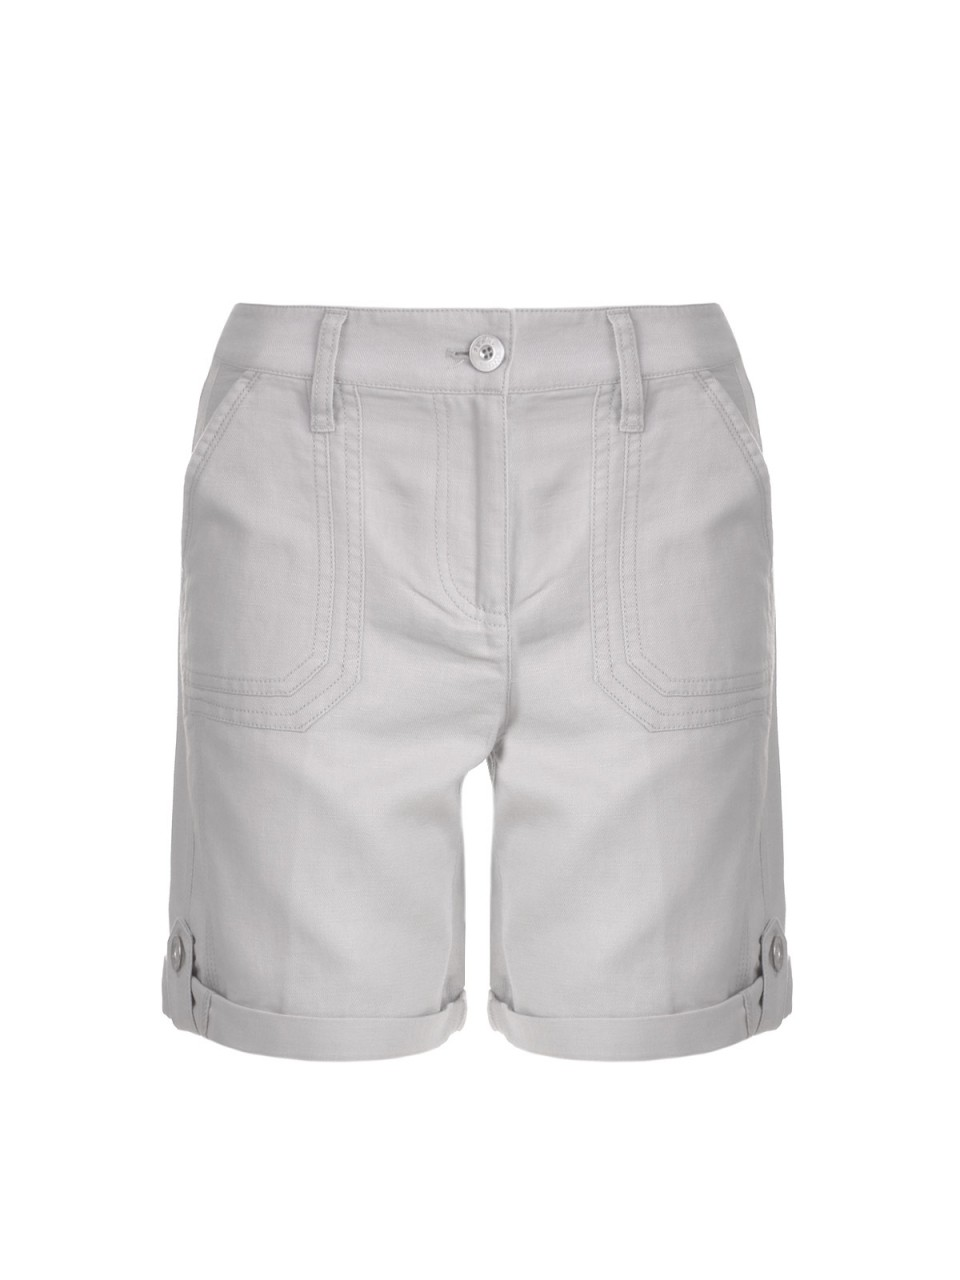 milano-italy-damen-shorts-grau